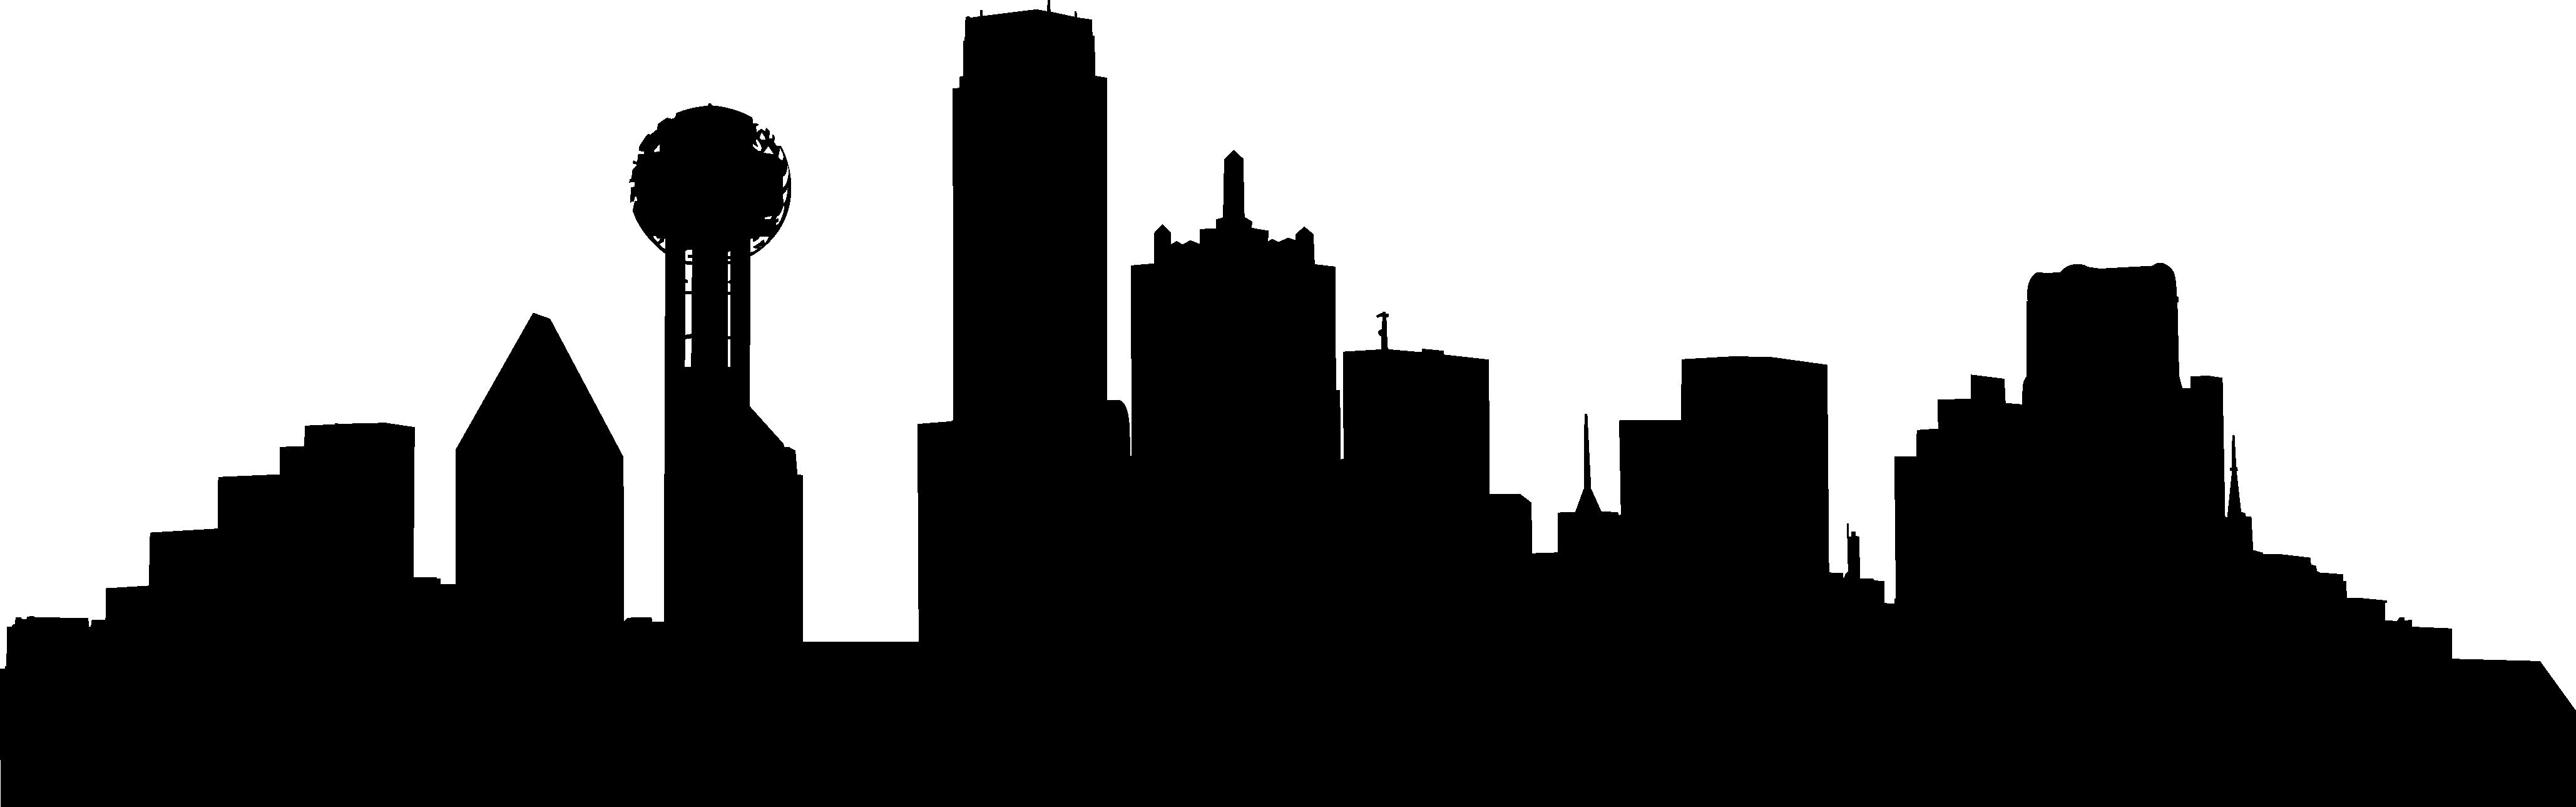 4116x1289 Vector Skyline